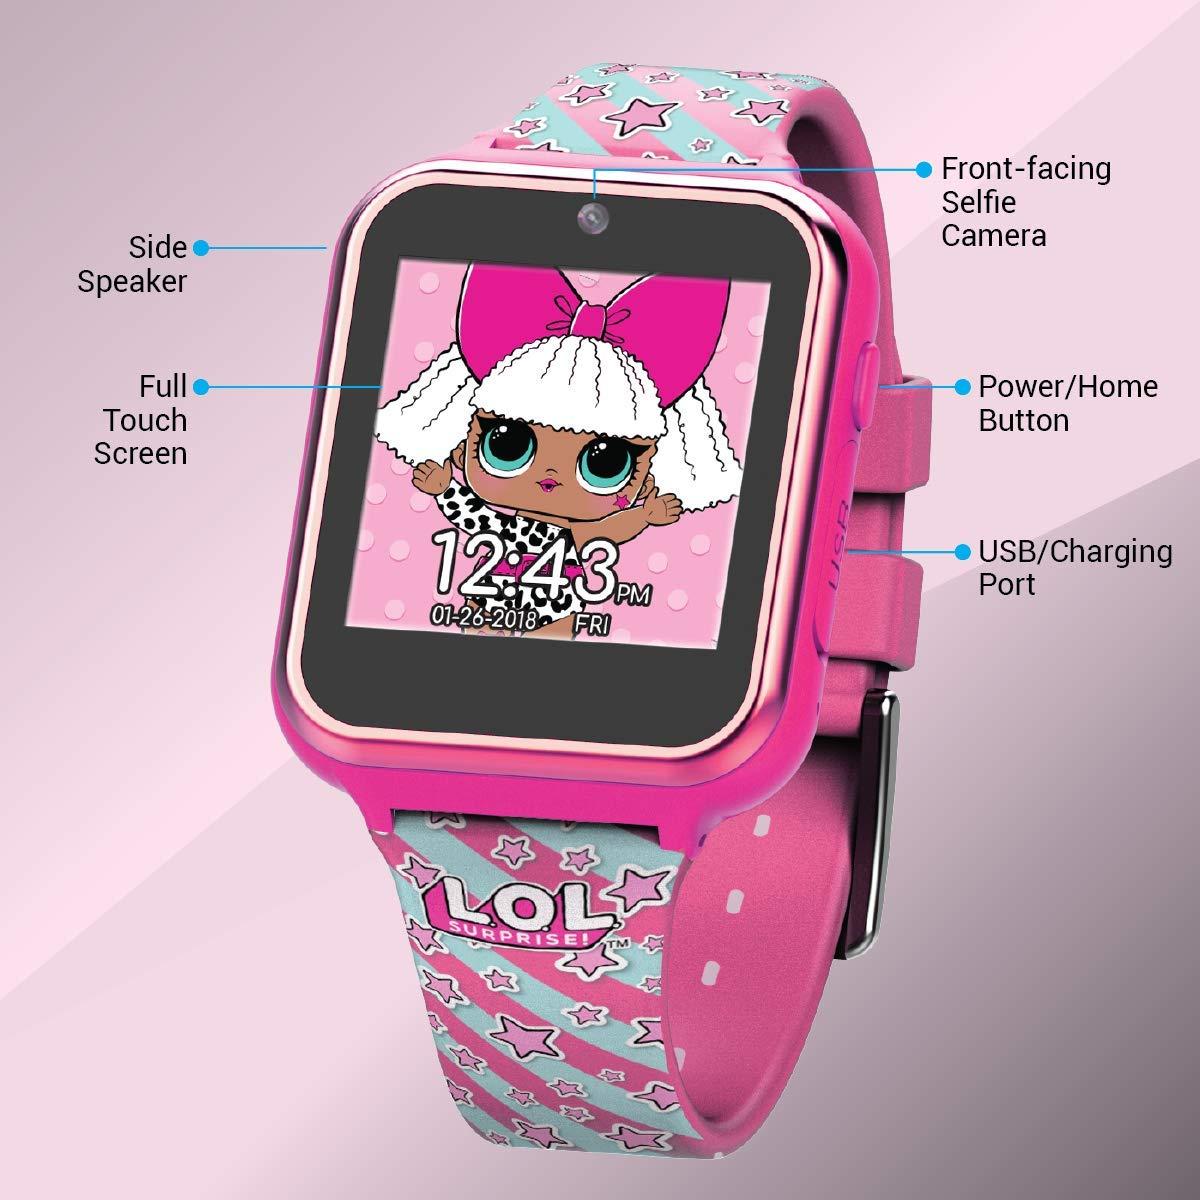 Amazon.com: L.O.L. ¡Sorprenda! Reloj de pantalla táctil con ...